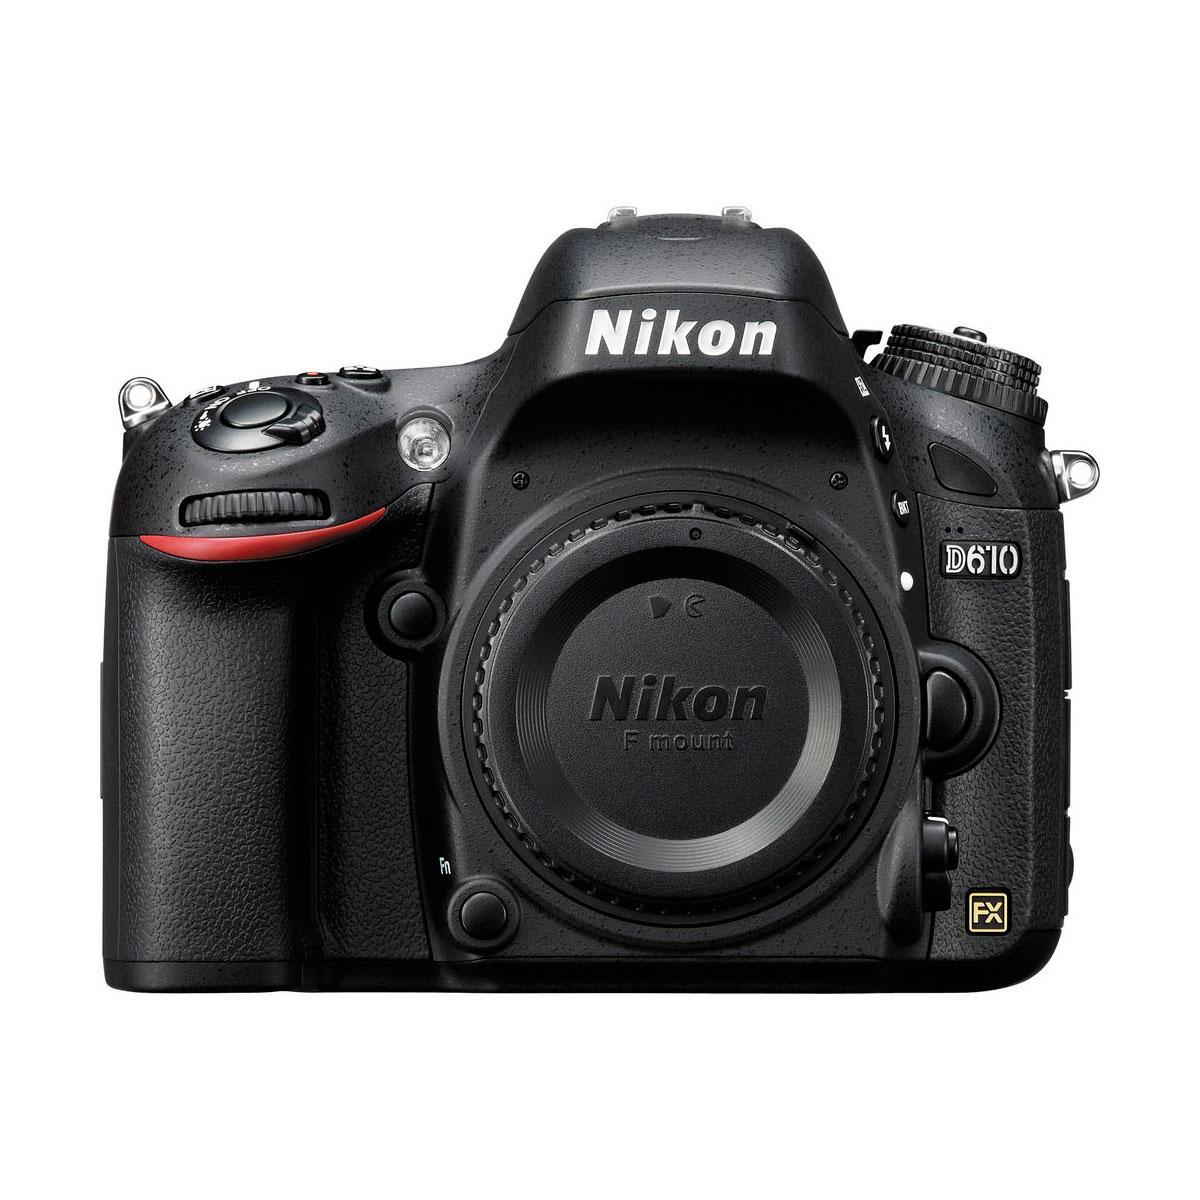 Nikon D610 runko